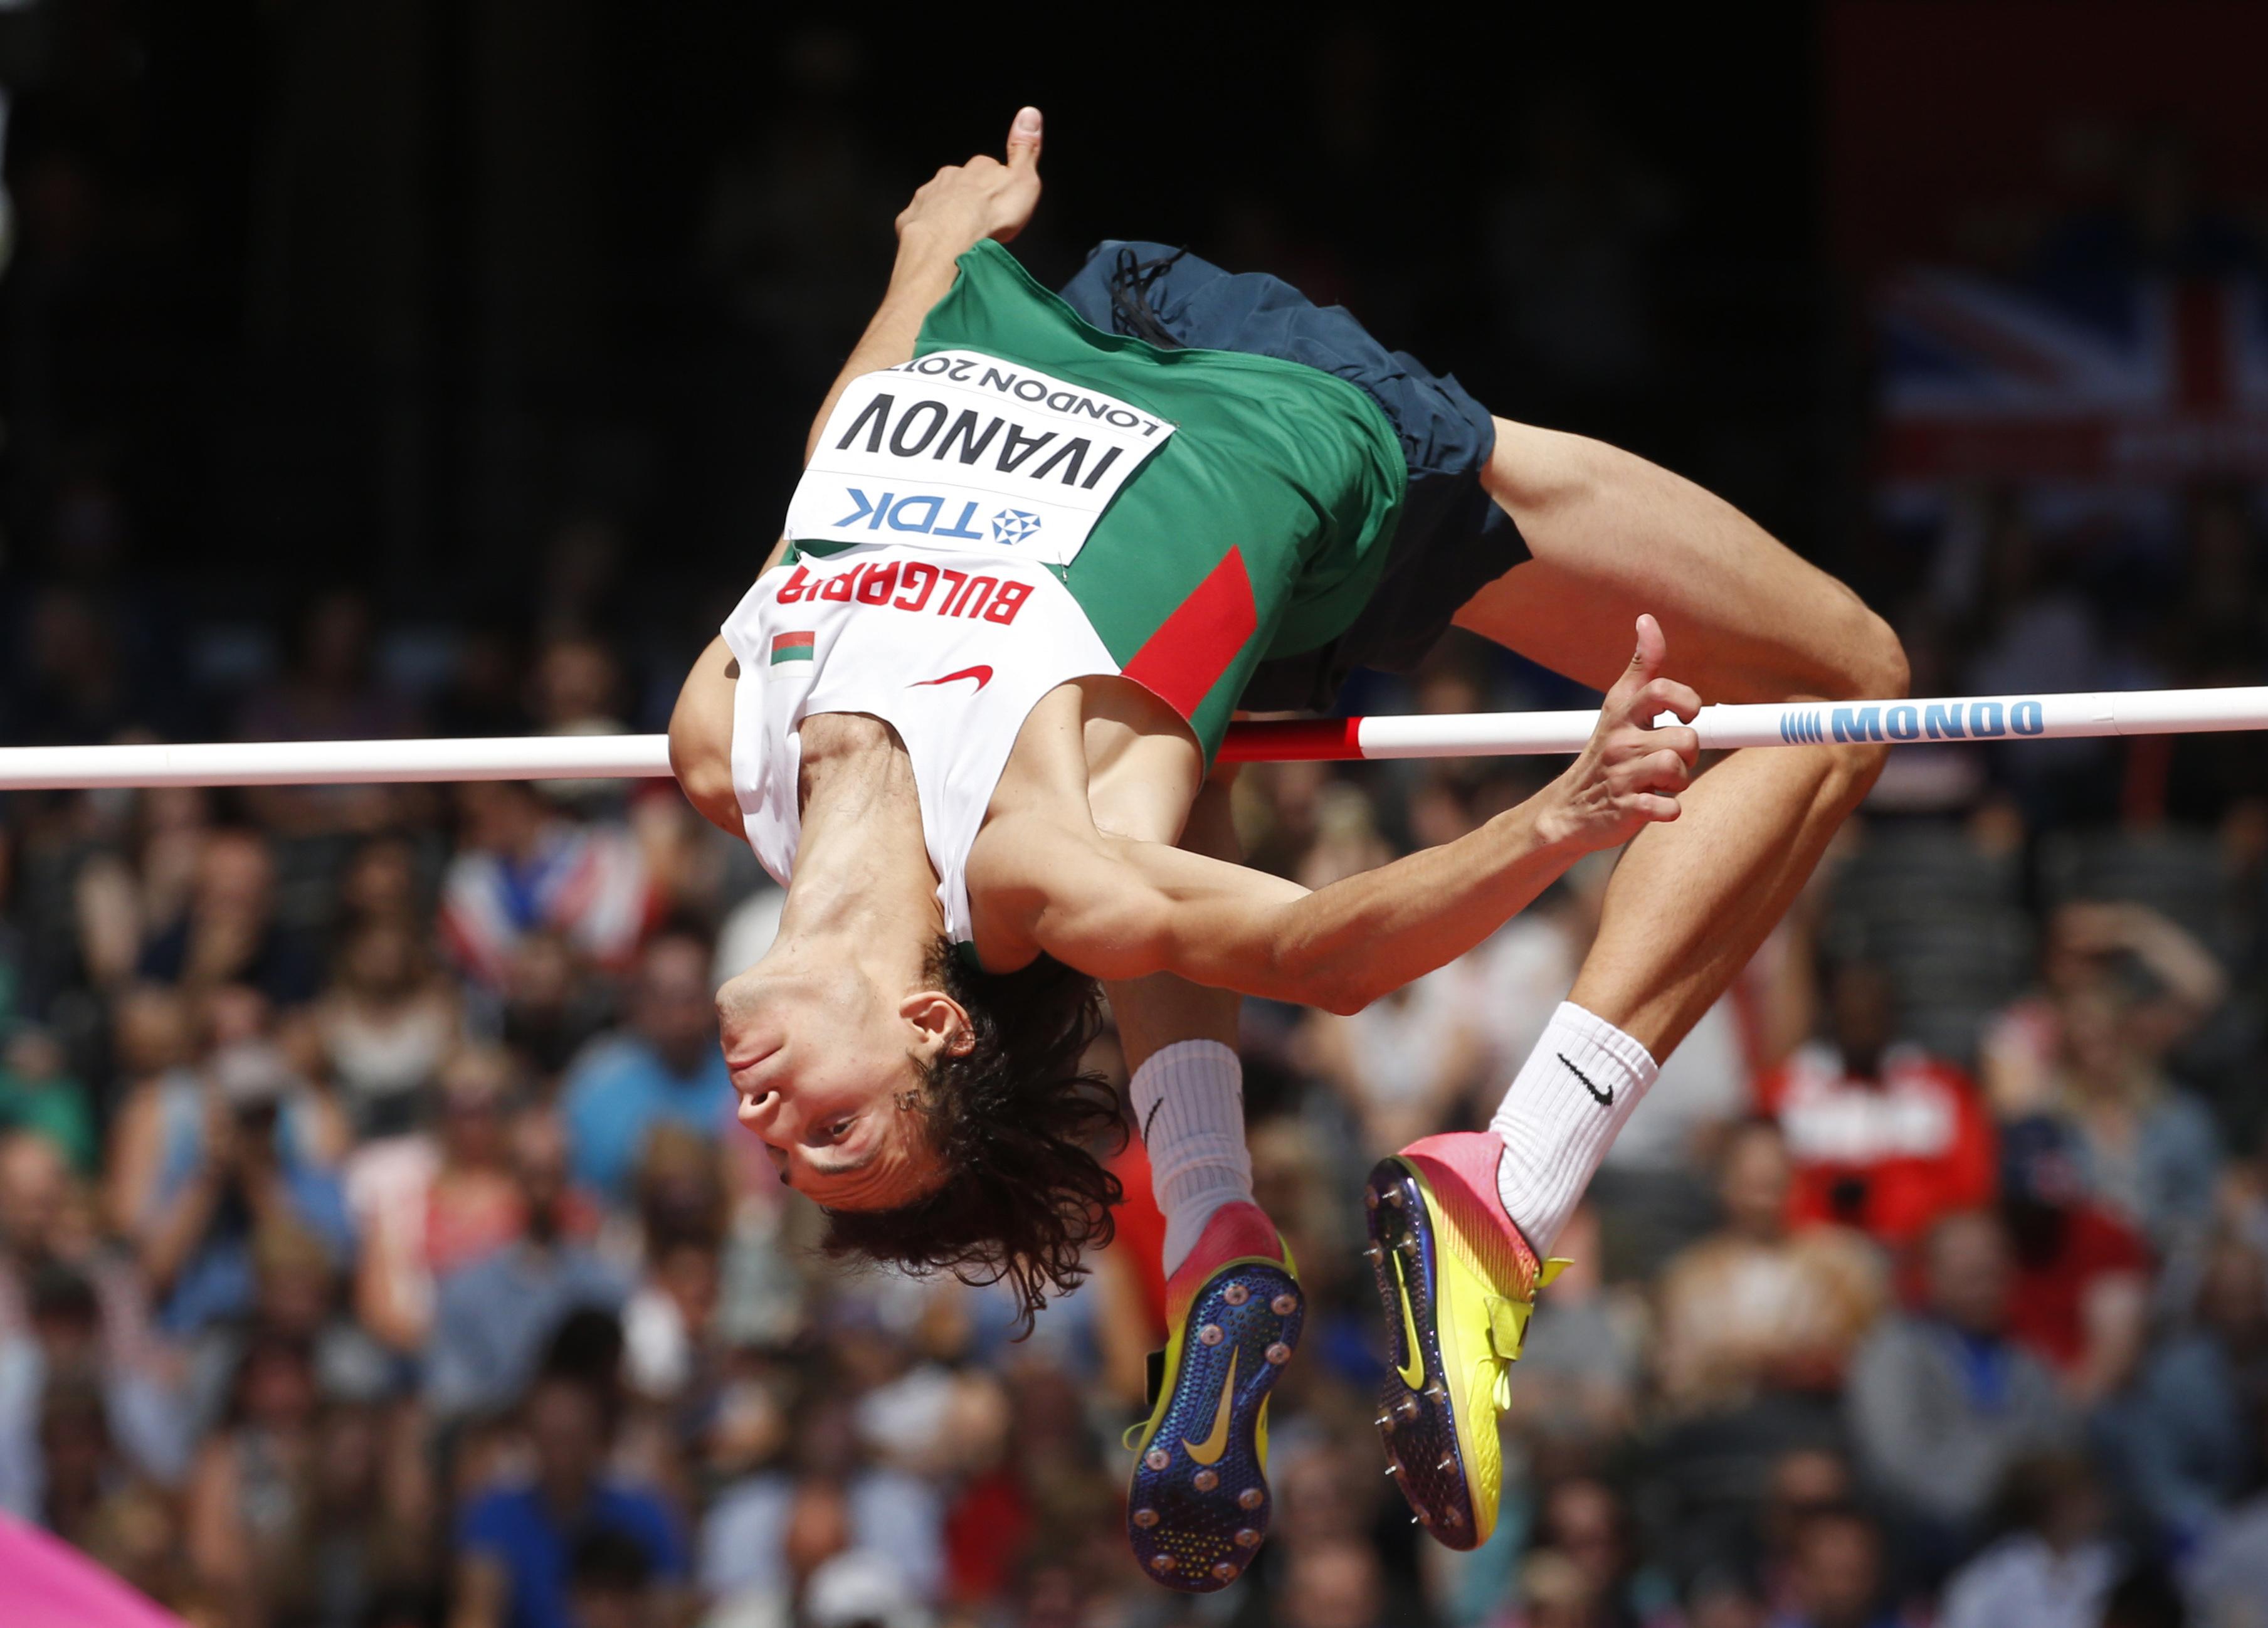 Последно българско участие в Лондон днес